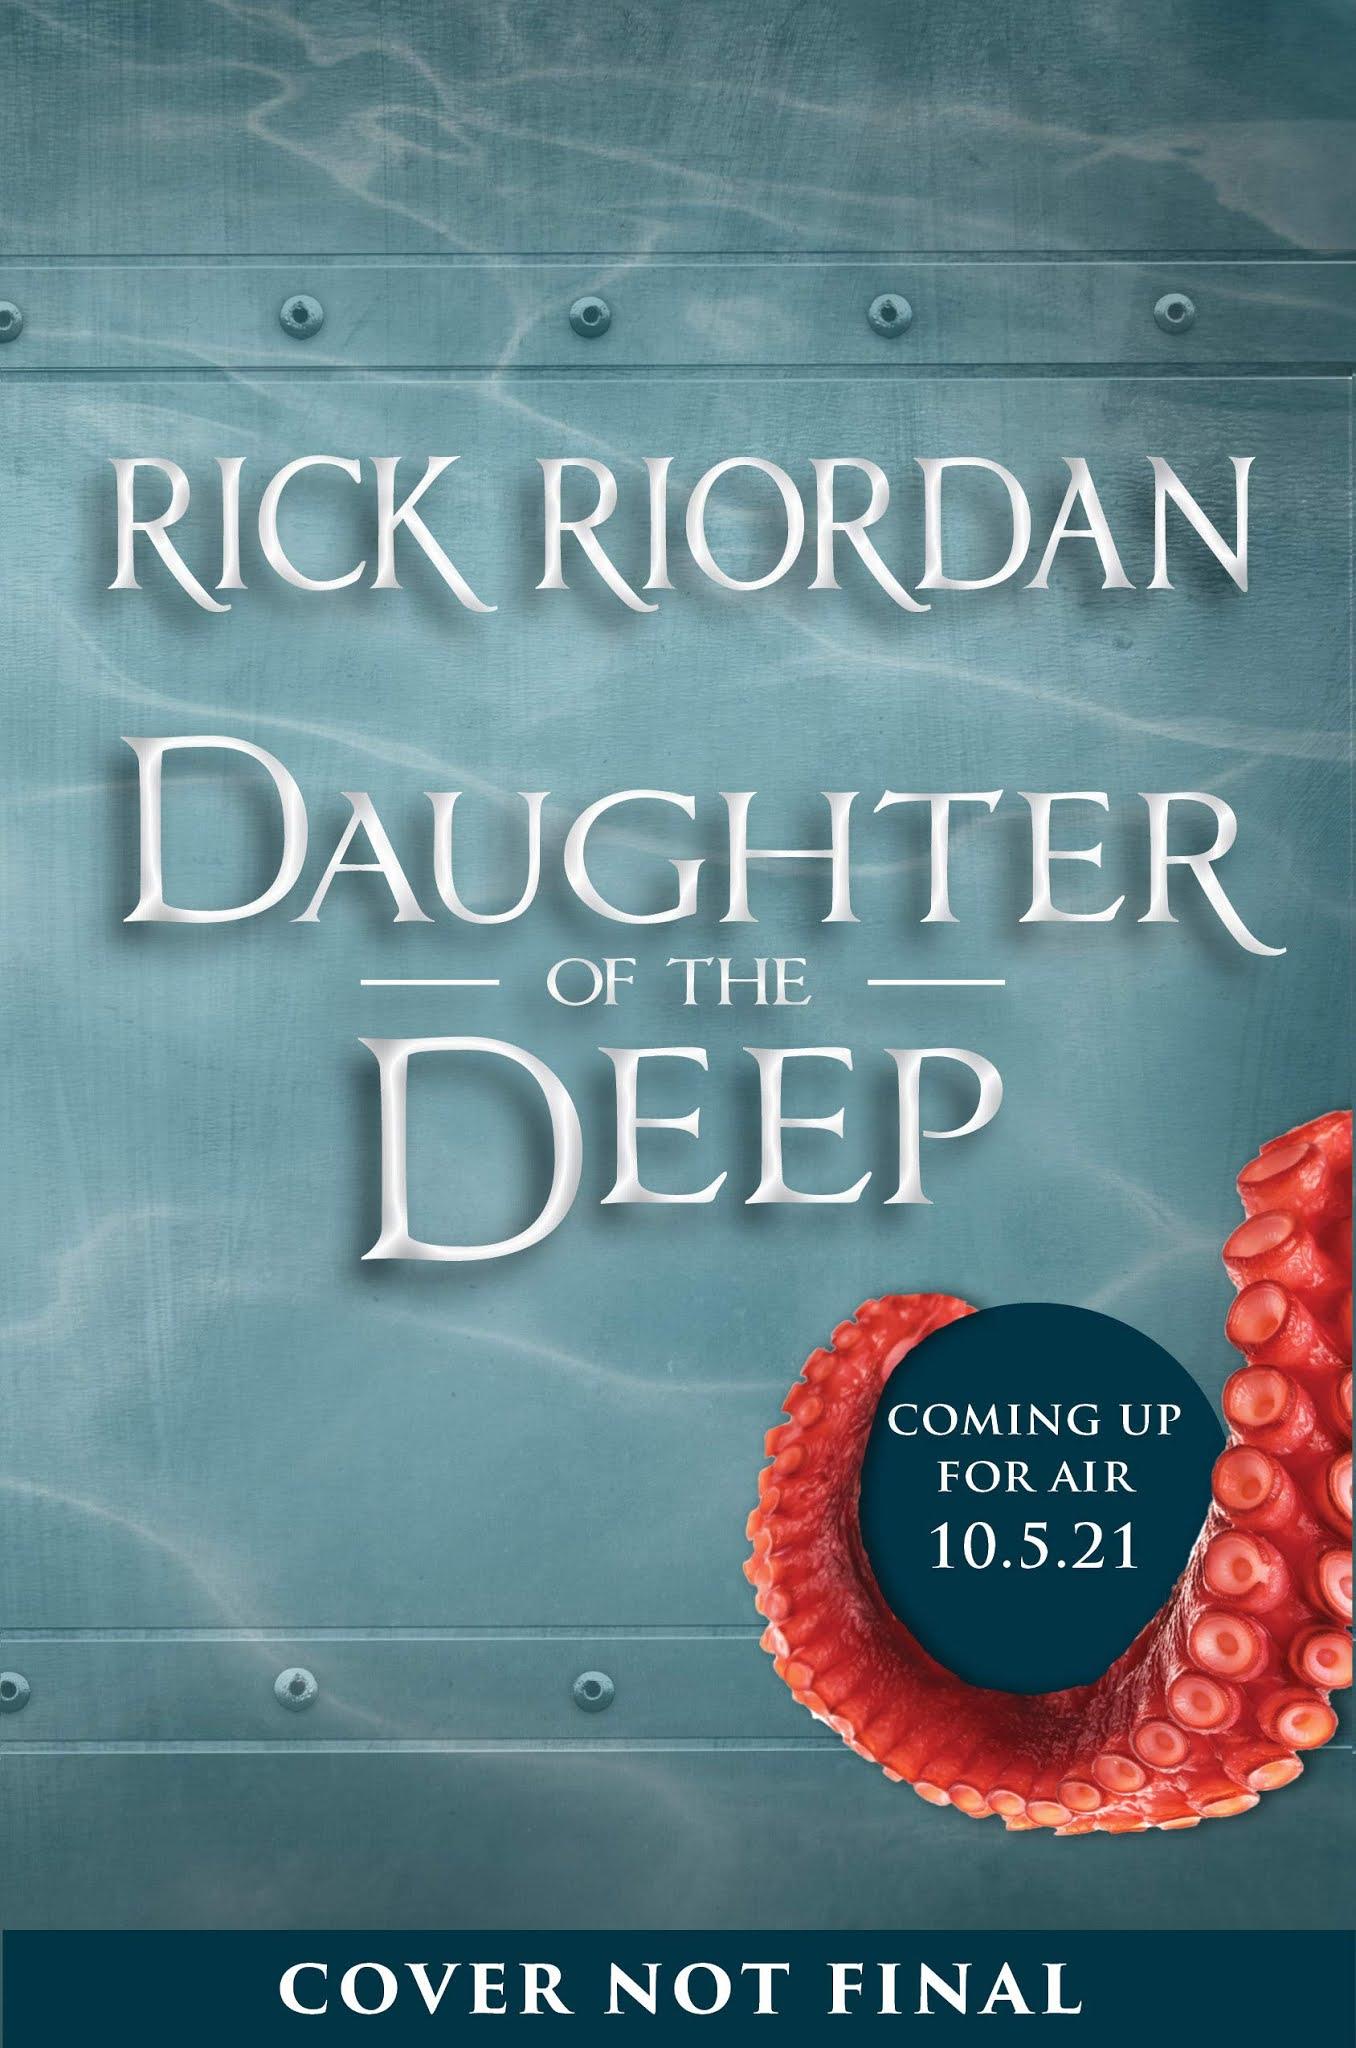 Daughter of the Deep by Rick Riordan